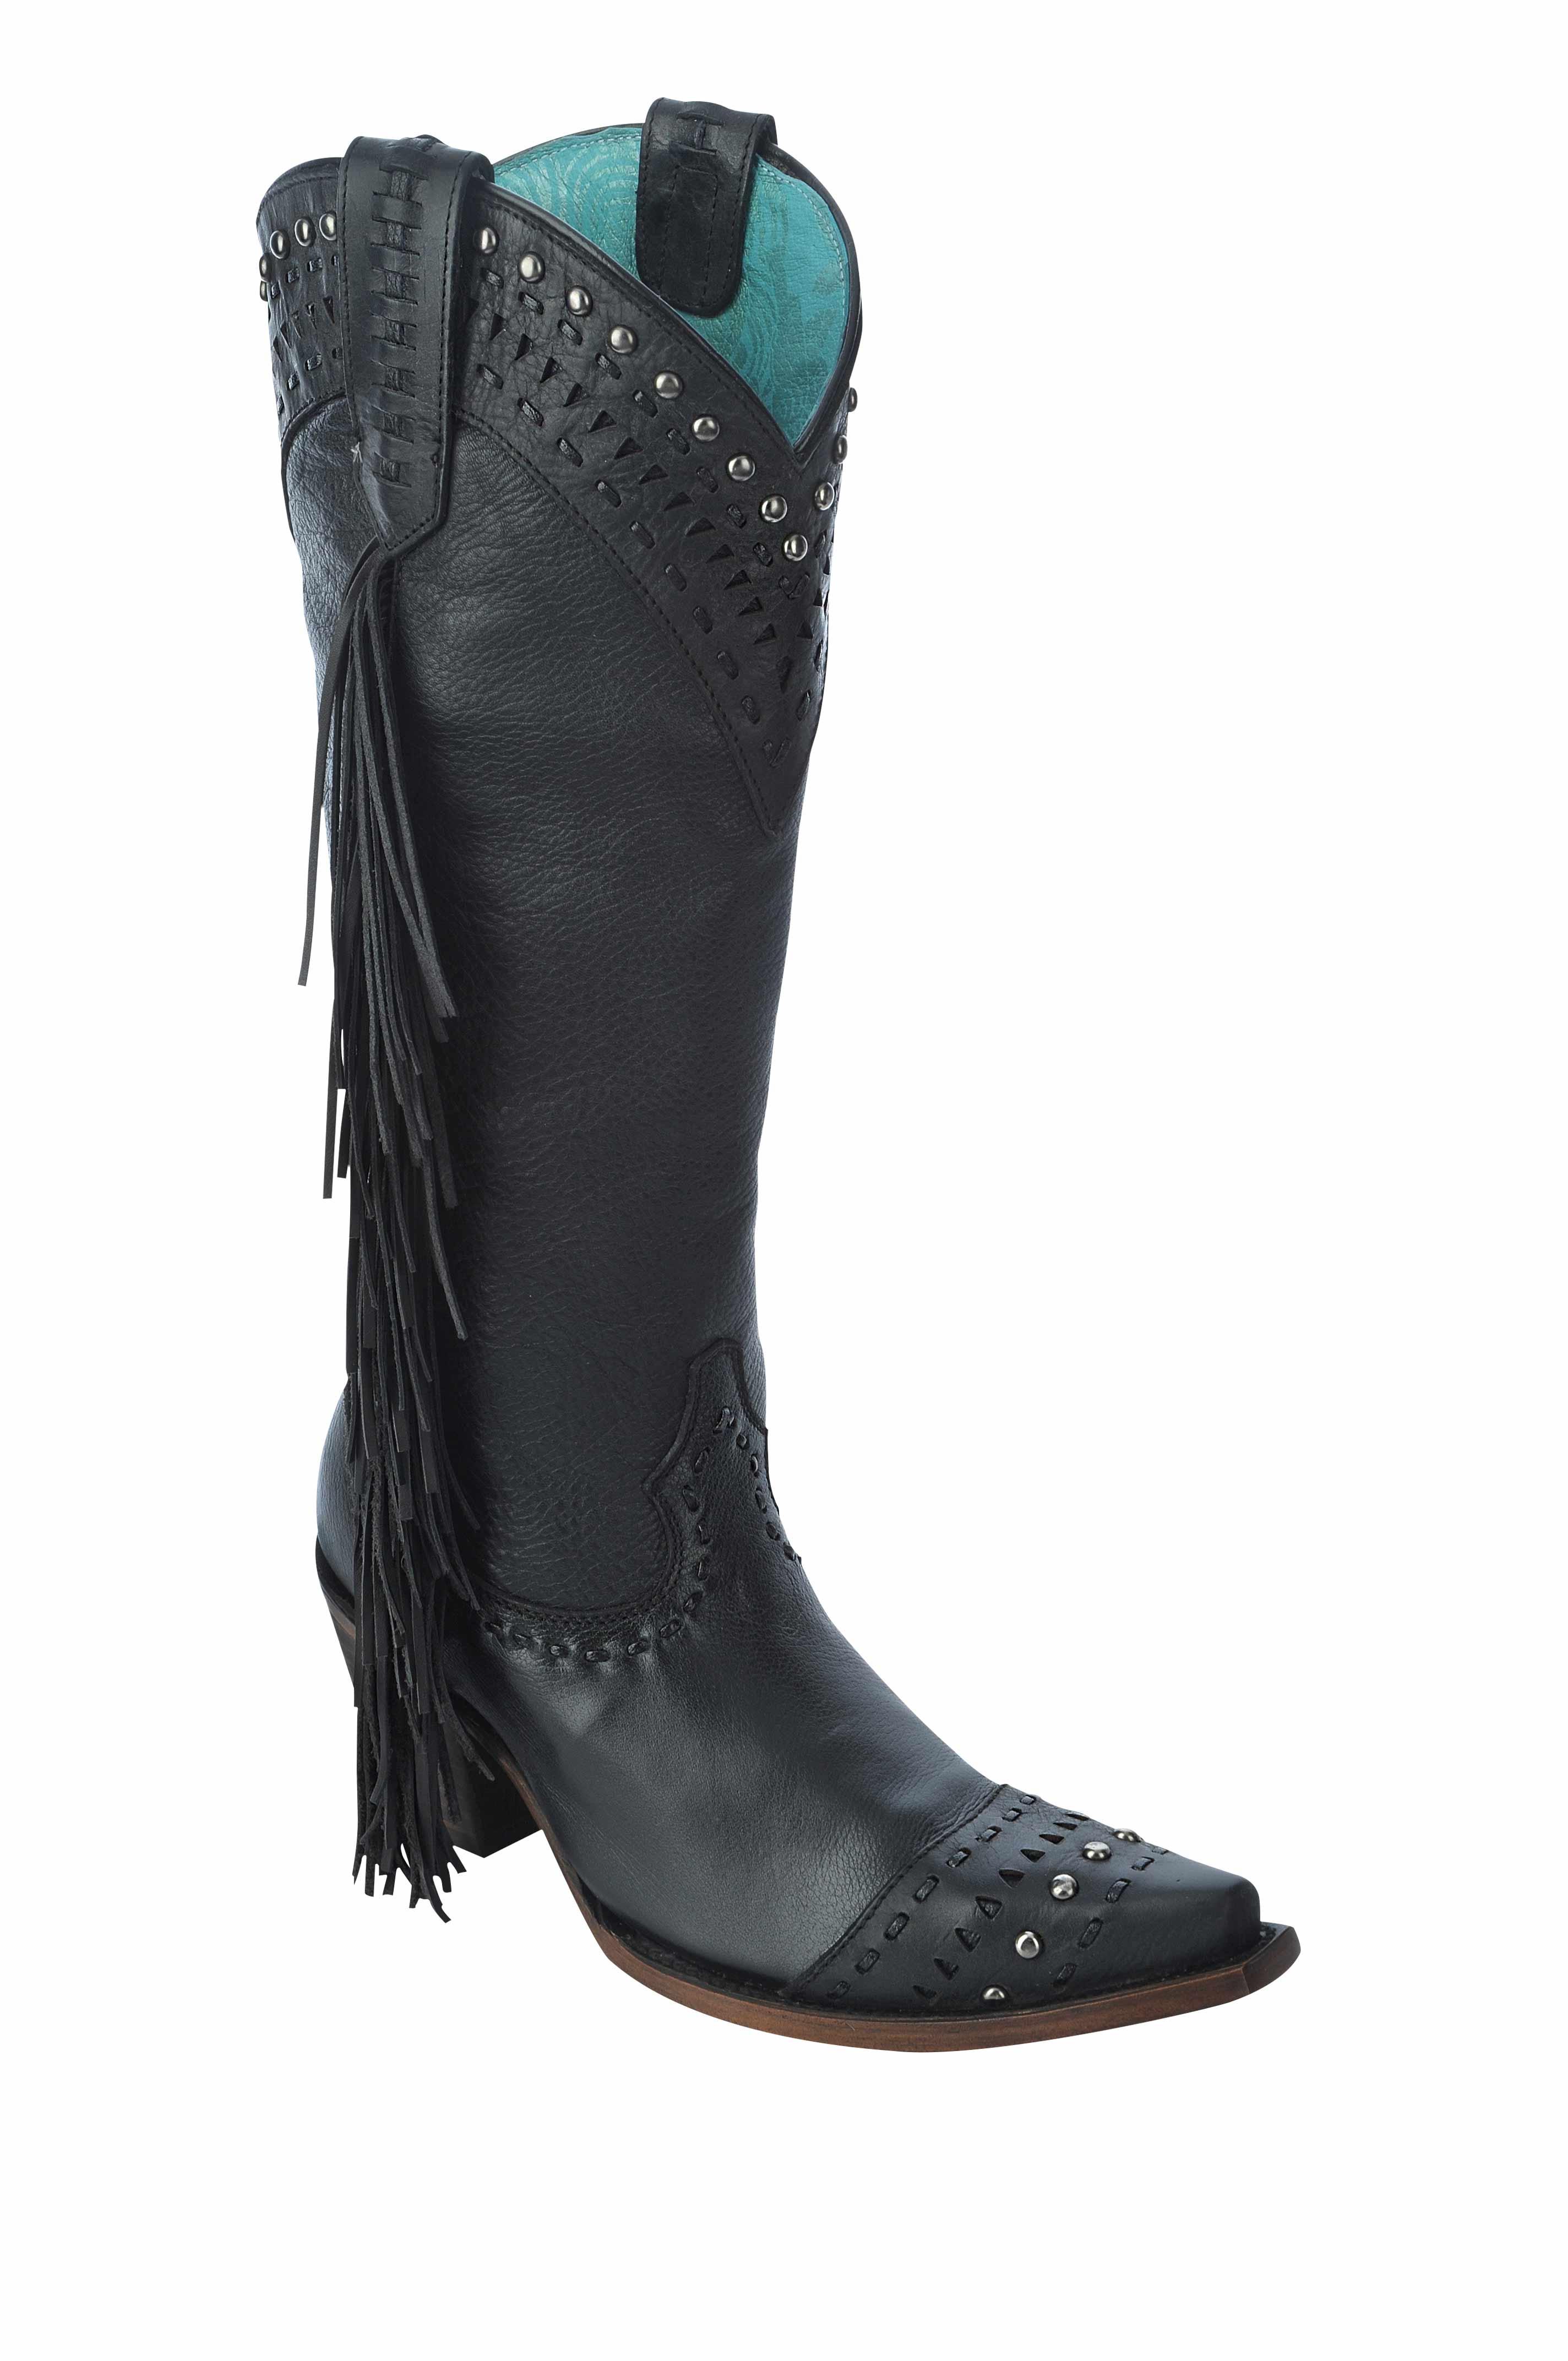 Black Cowgirl Fashion Boots